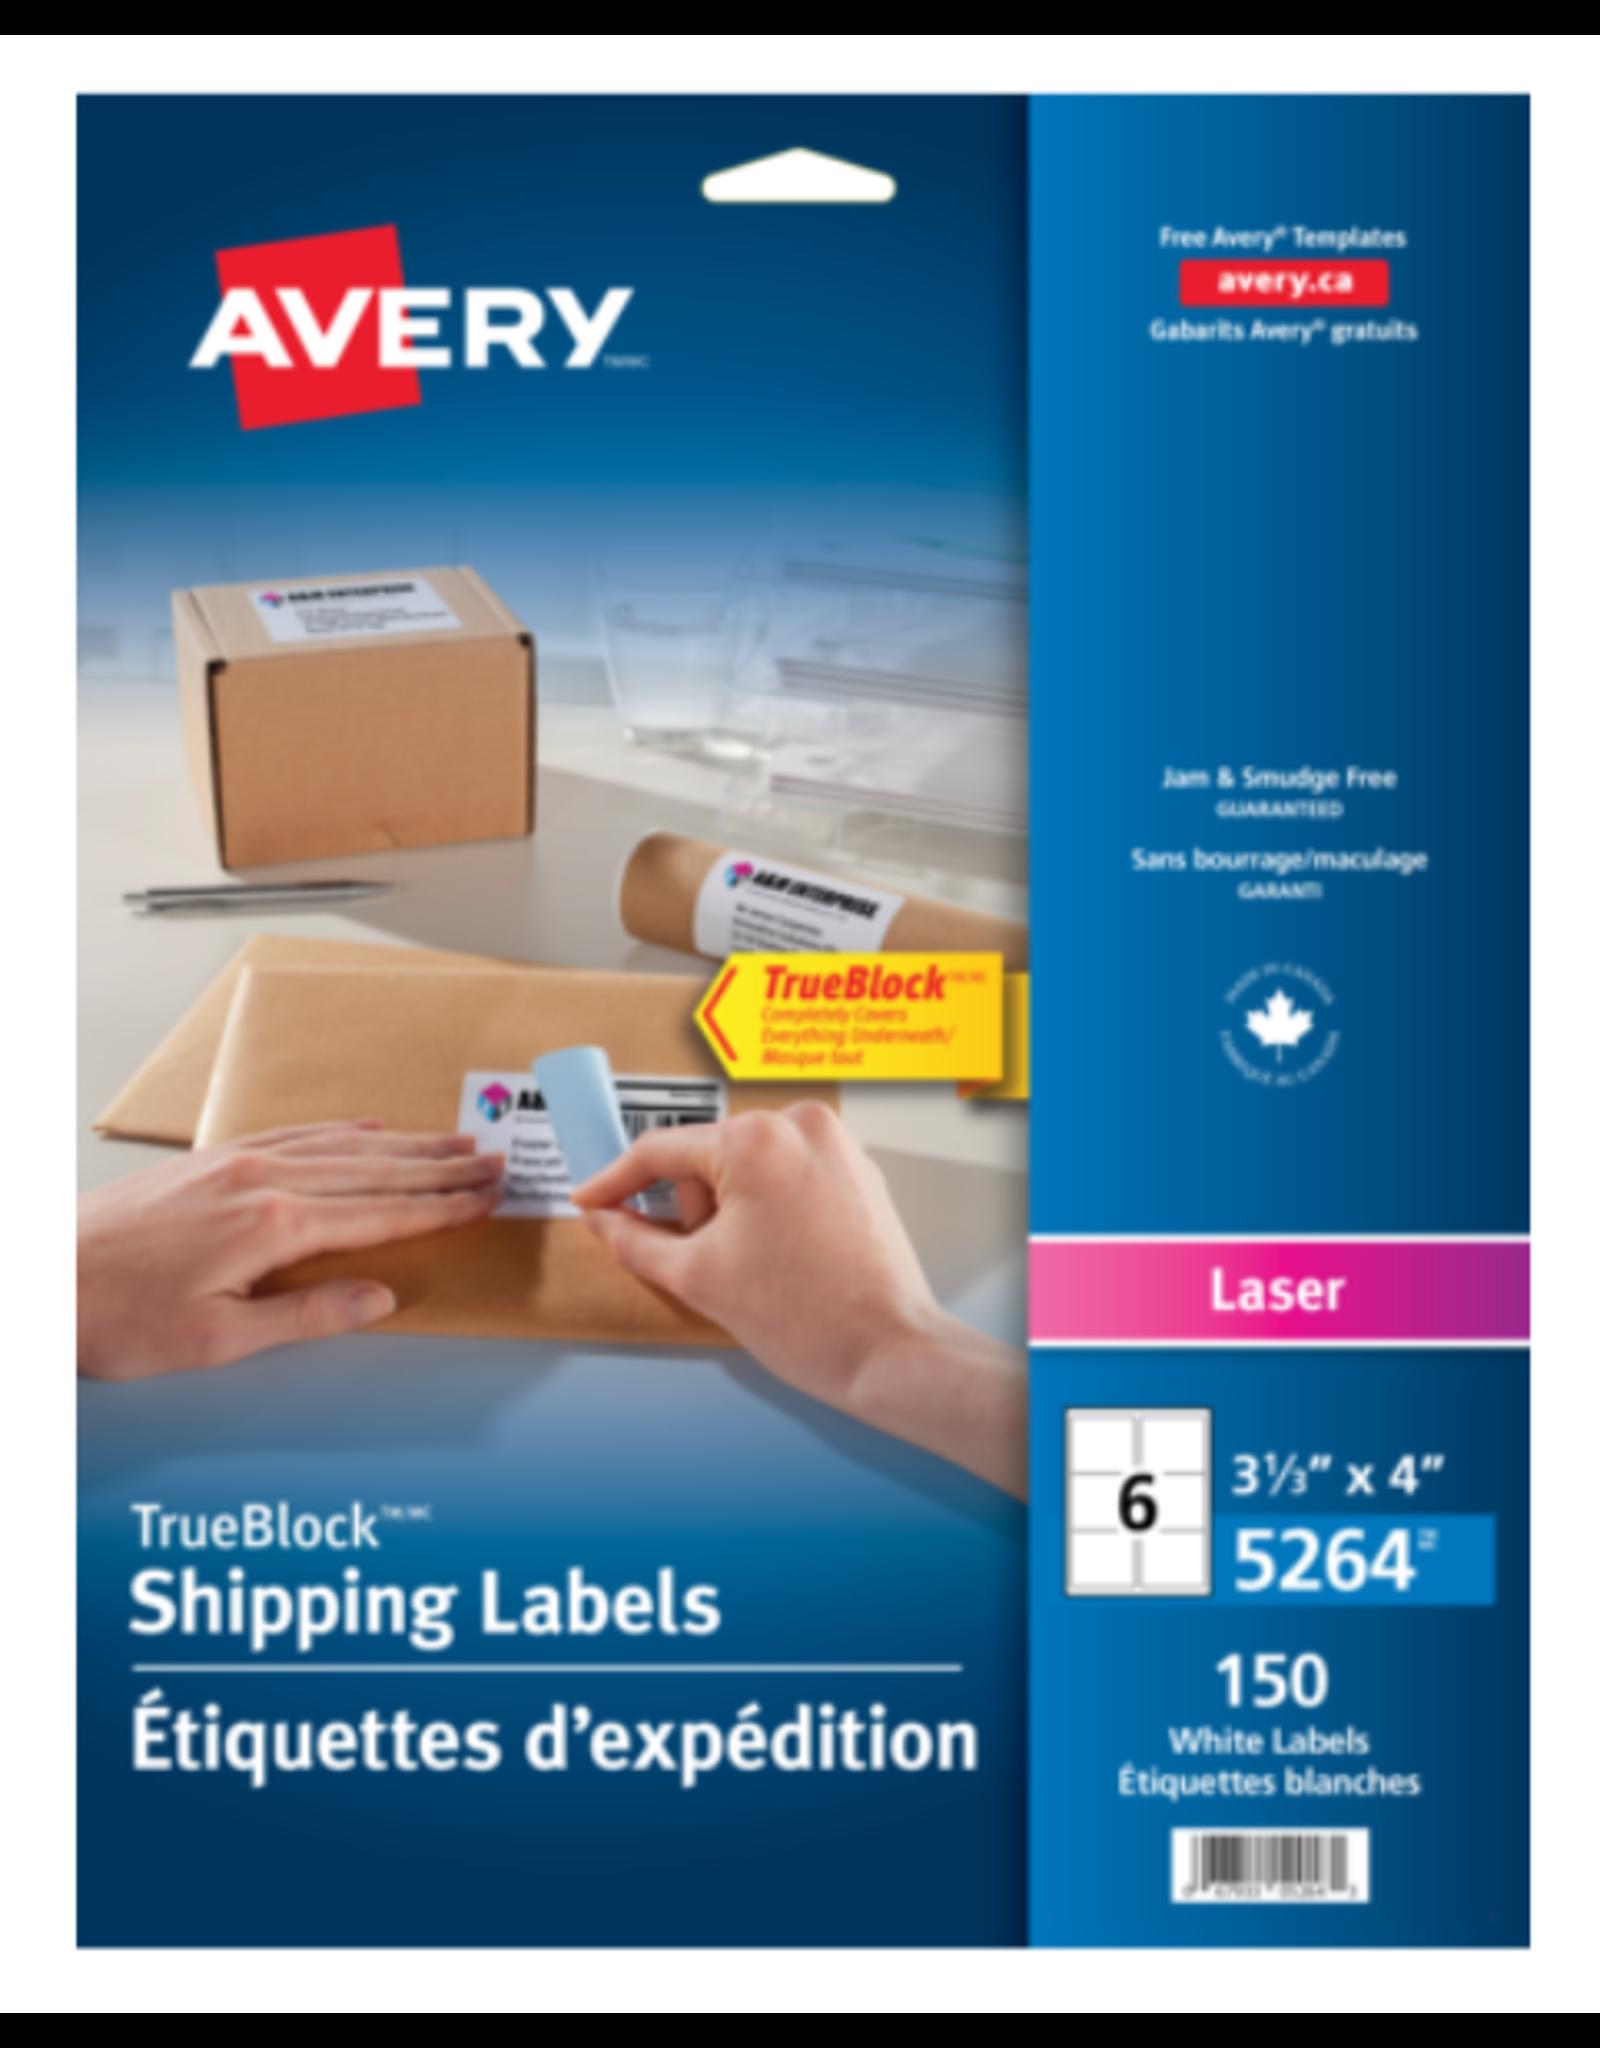 Avery LABELS-SHIPPING TRUEBLOCK WHITE 3-1/3X4 150/EV